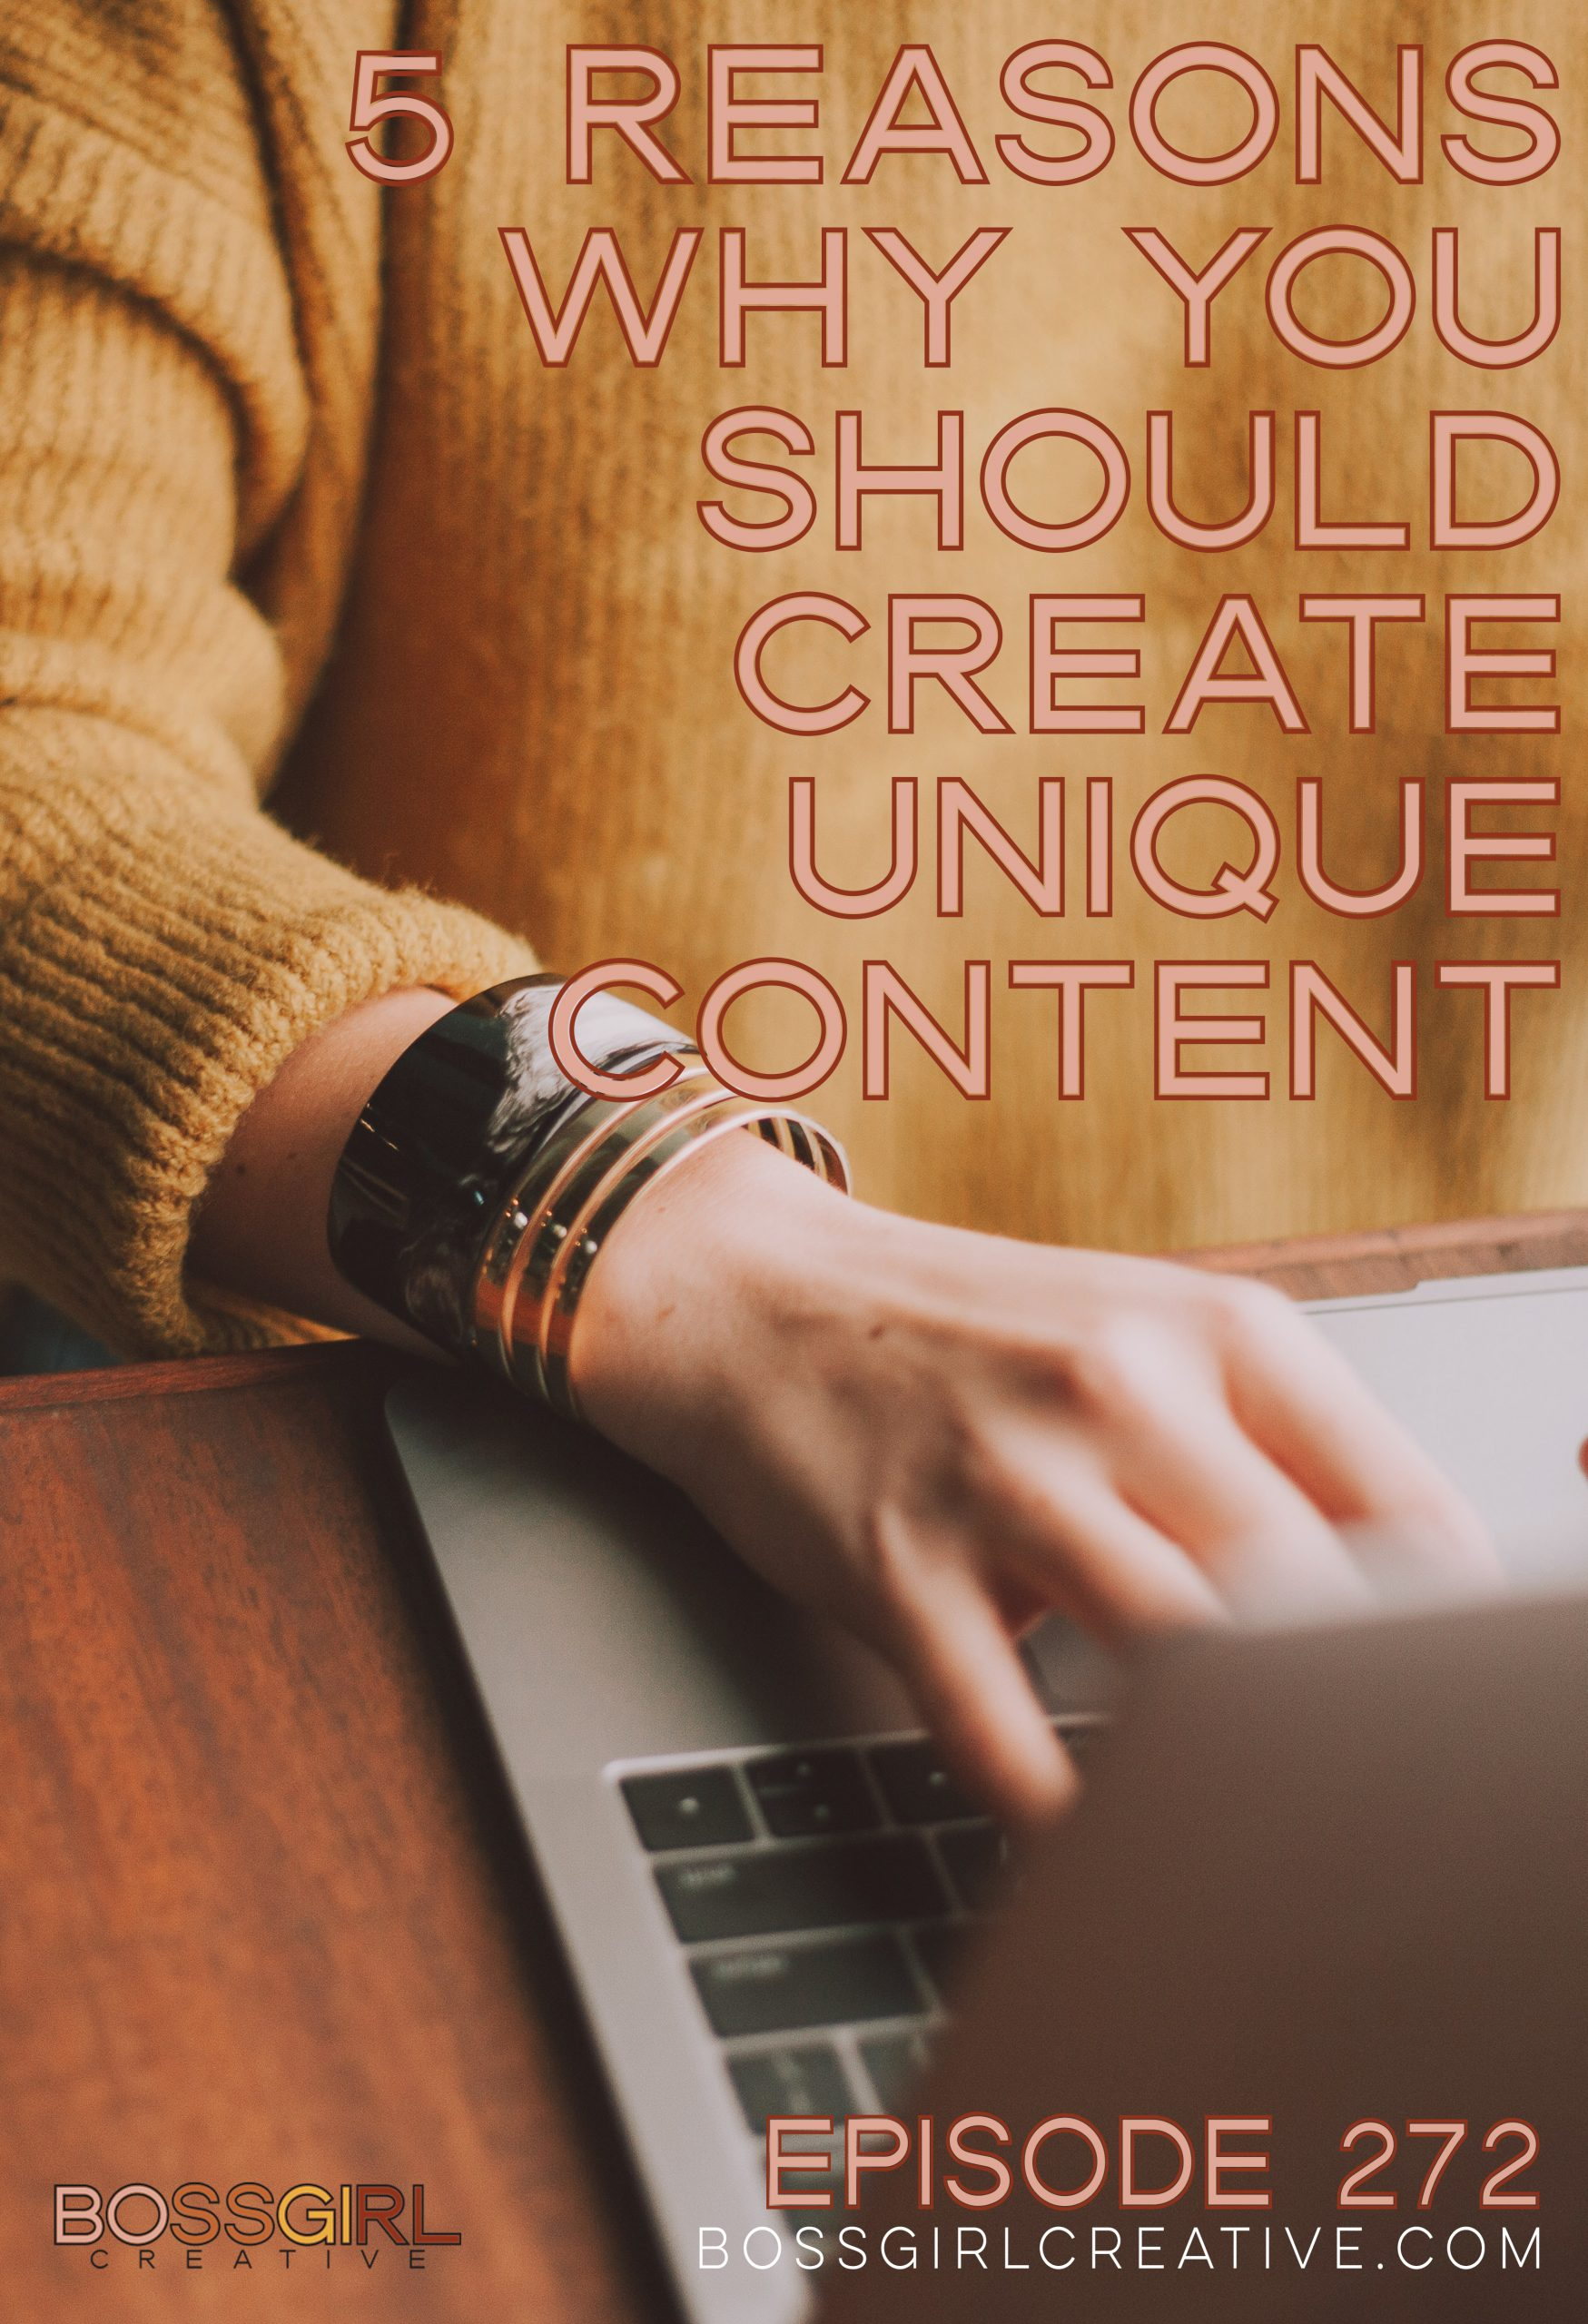 BGC Episode 272 - 5 Reasons Why You Should Create Unique Content